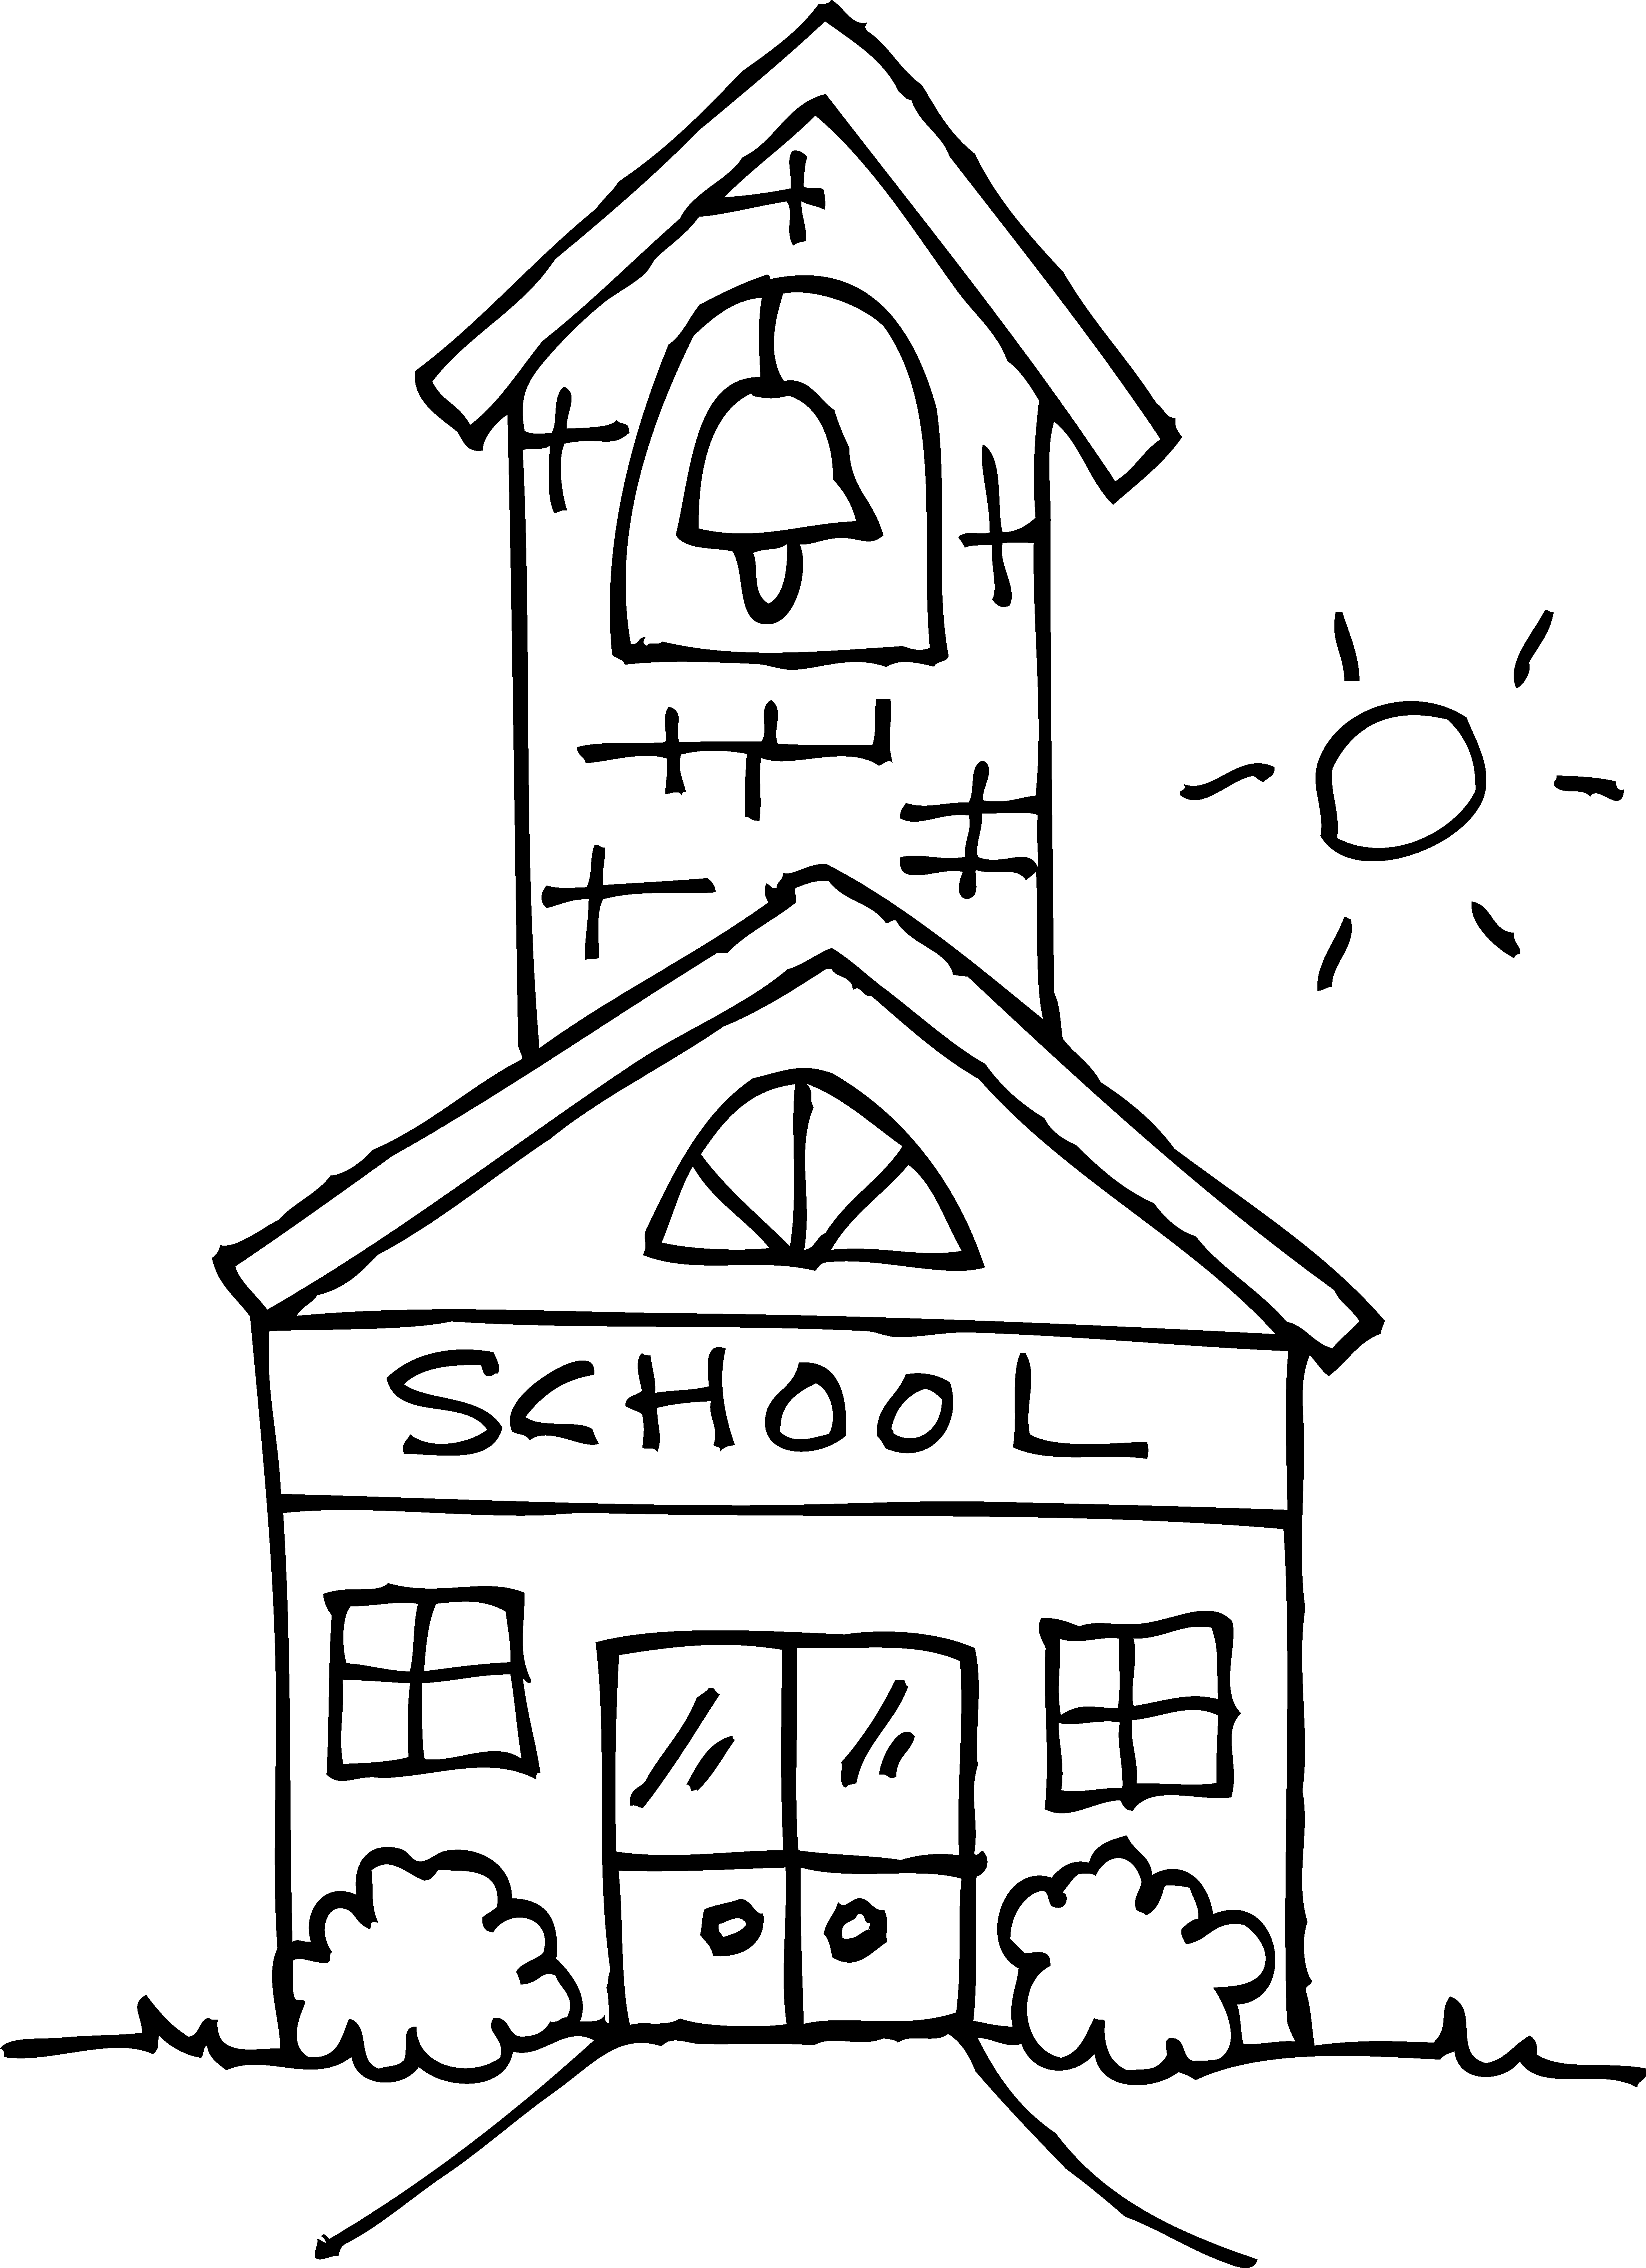 Mansion clipart building outline House house Cartoon school clip